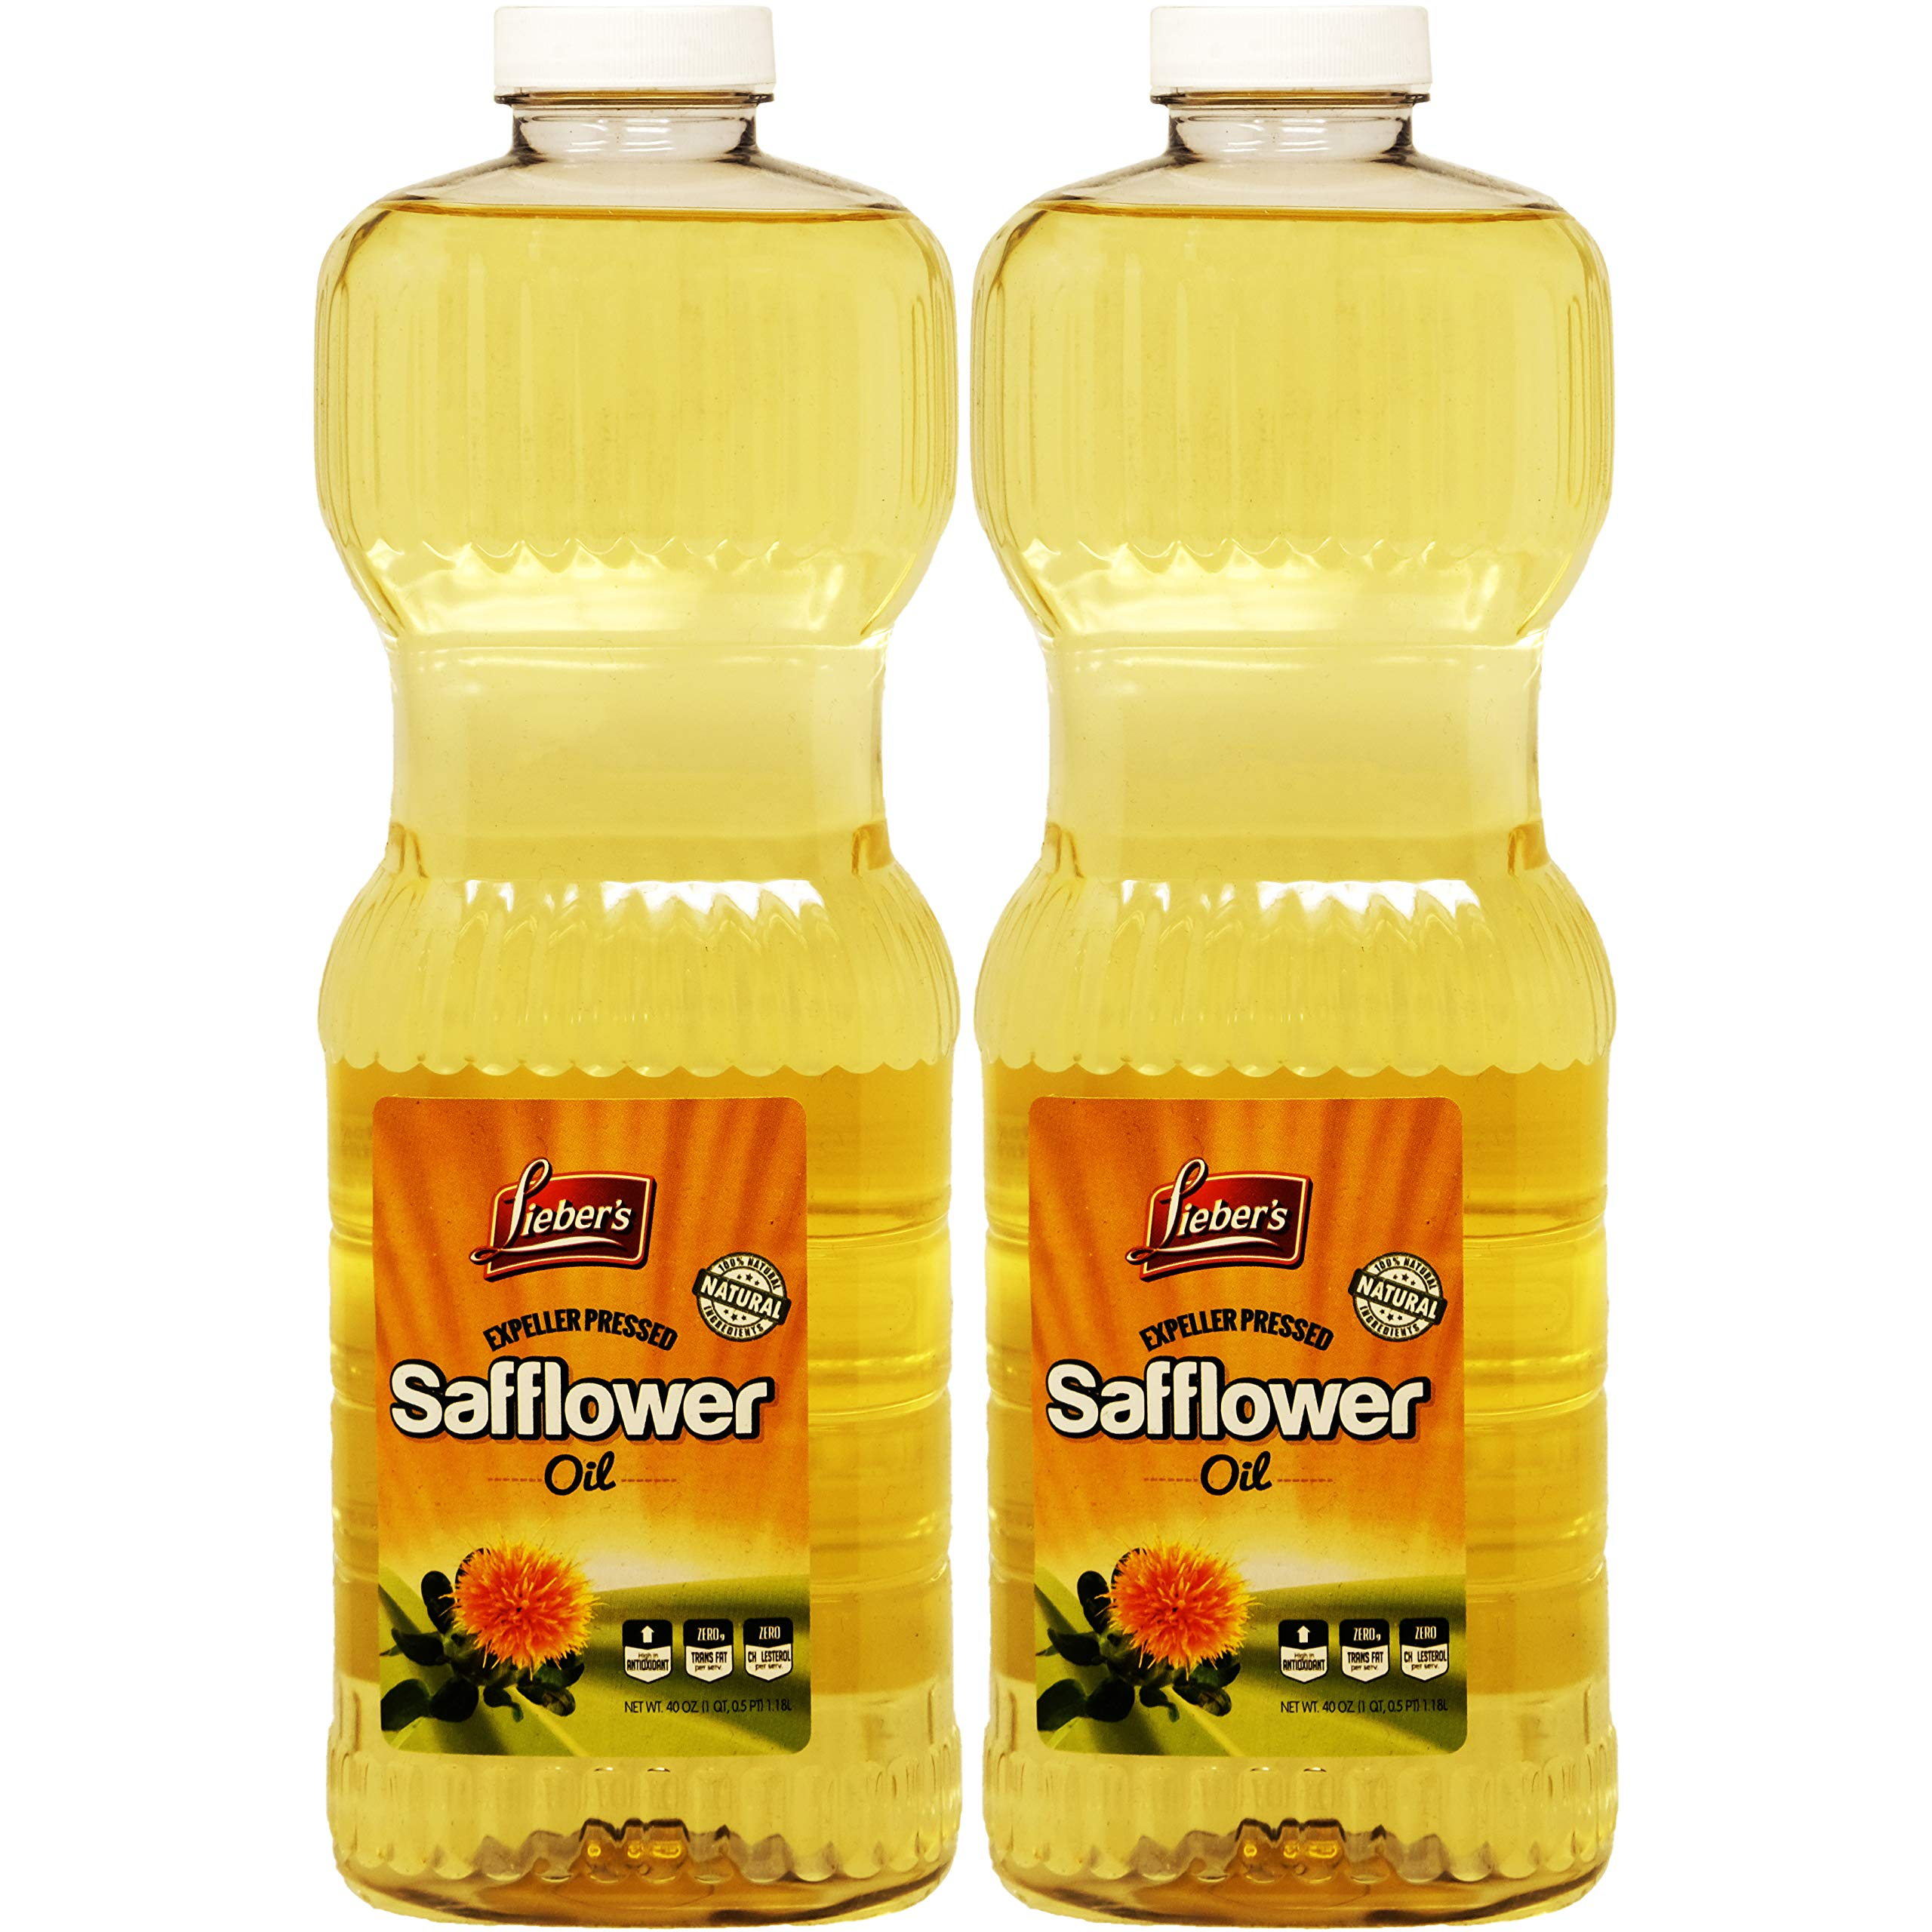 Safflower Oil, Kosher, 40 Ounce Bottle (Pack of 2) by Lieber's